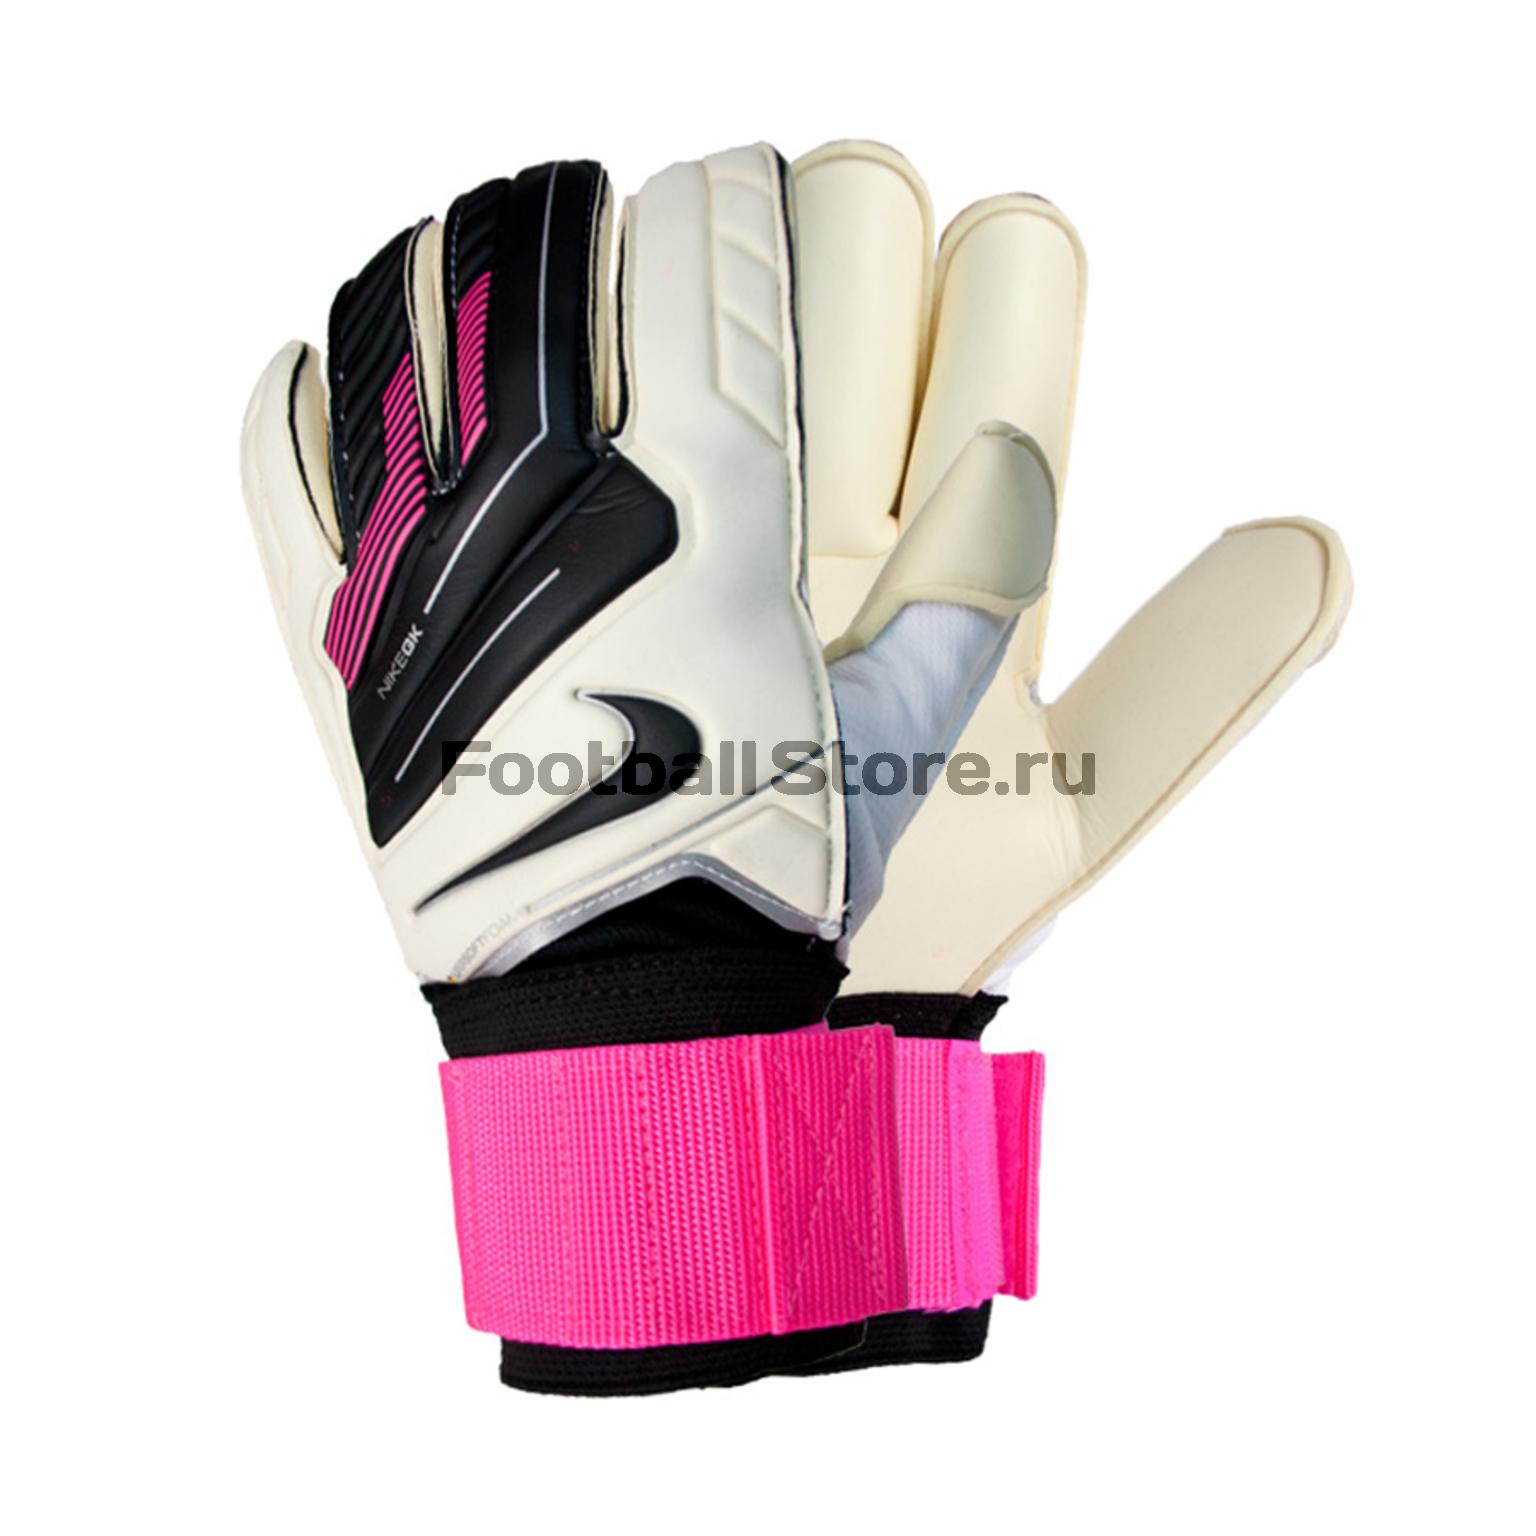 Перчатки Nike Вратарские перчатки Nike GK Gunn Cut Pro GS0255-165